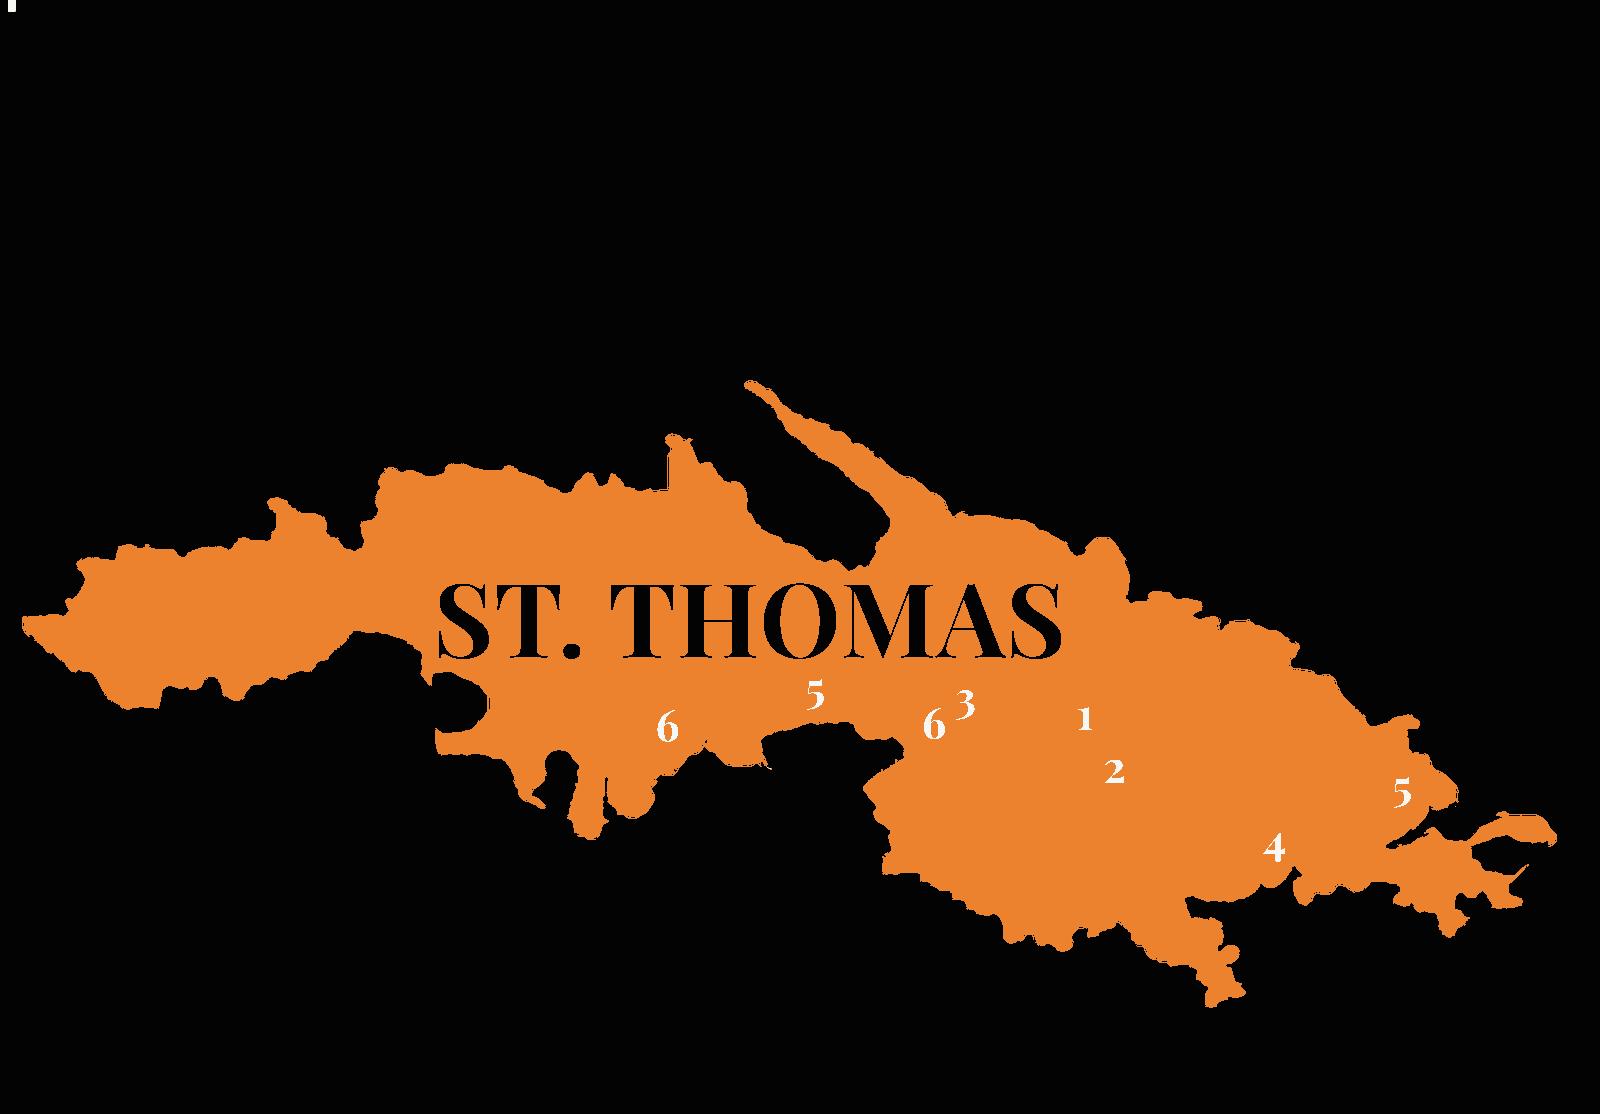 stthomasmap